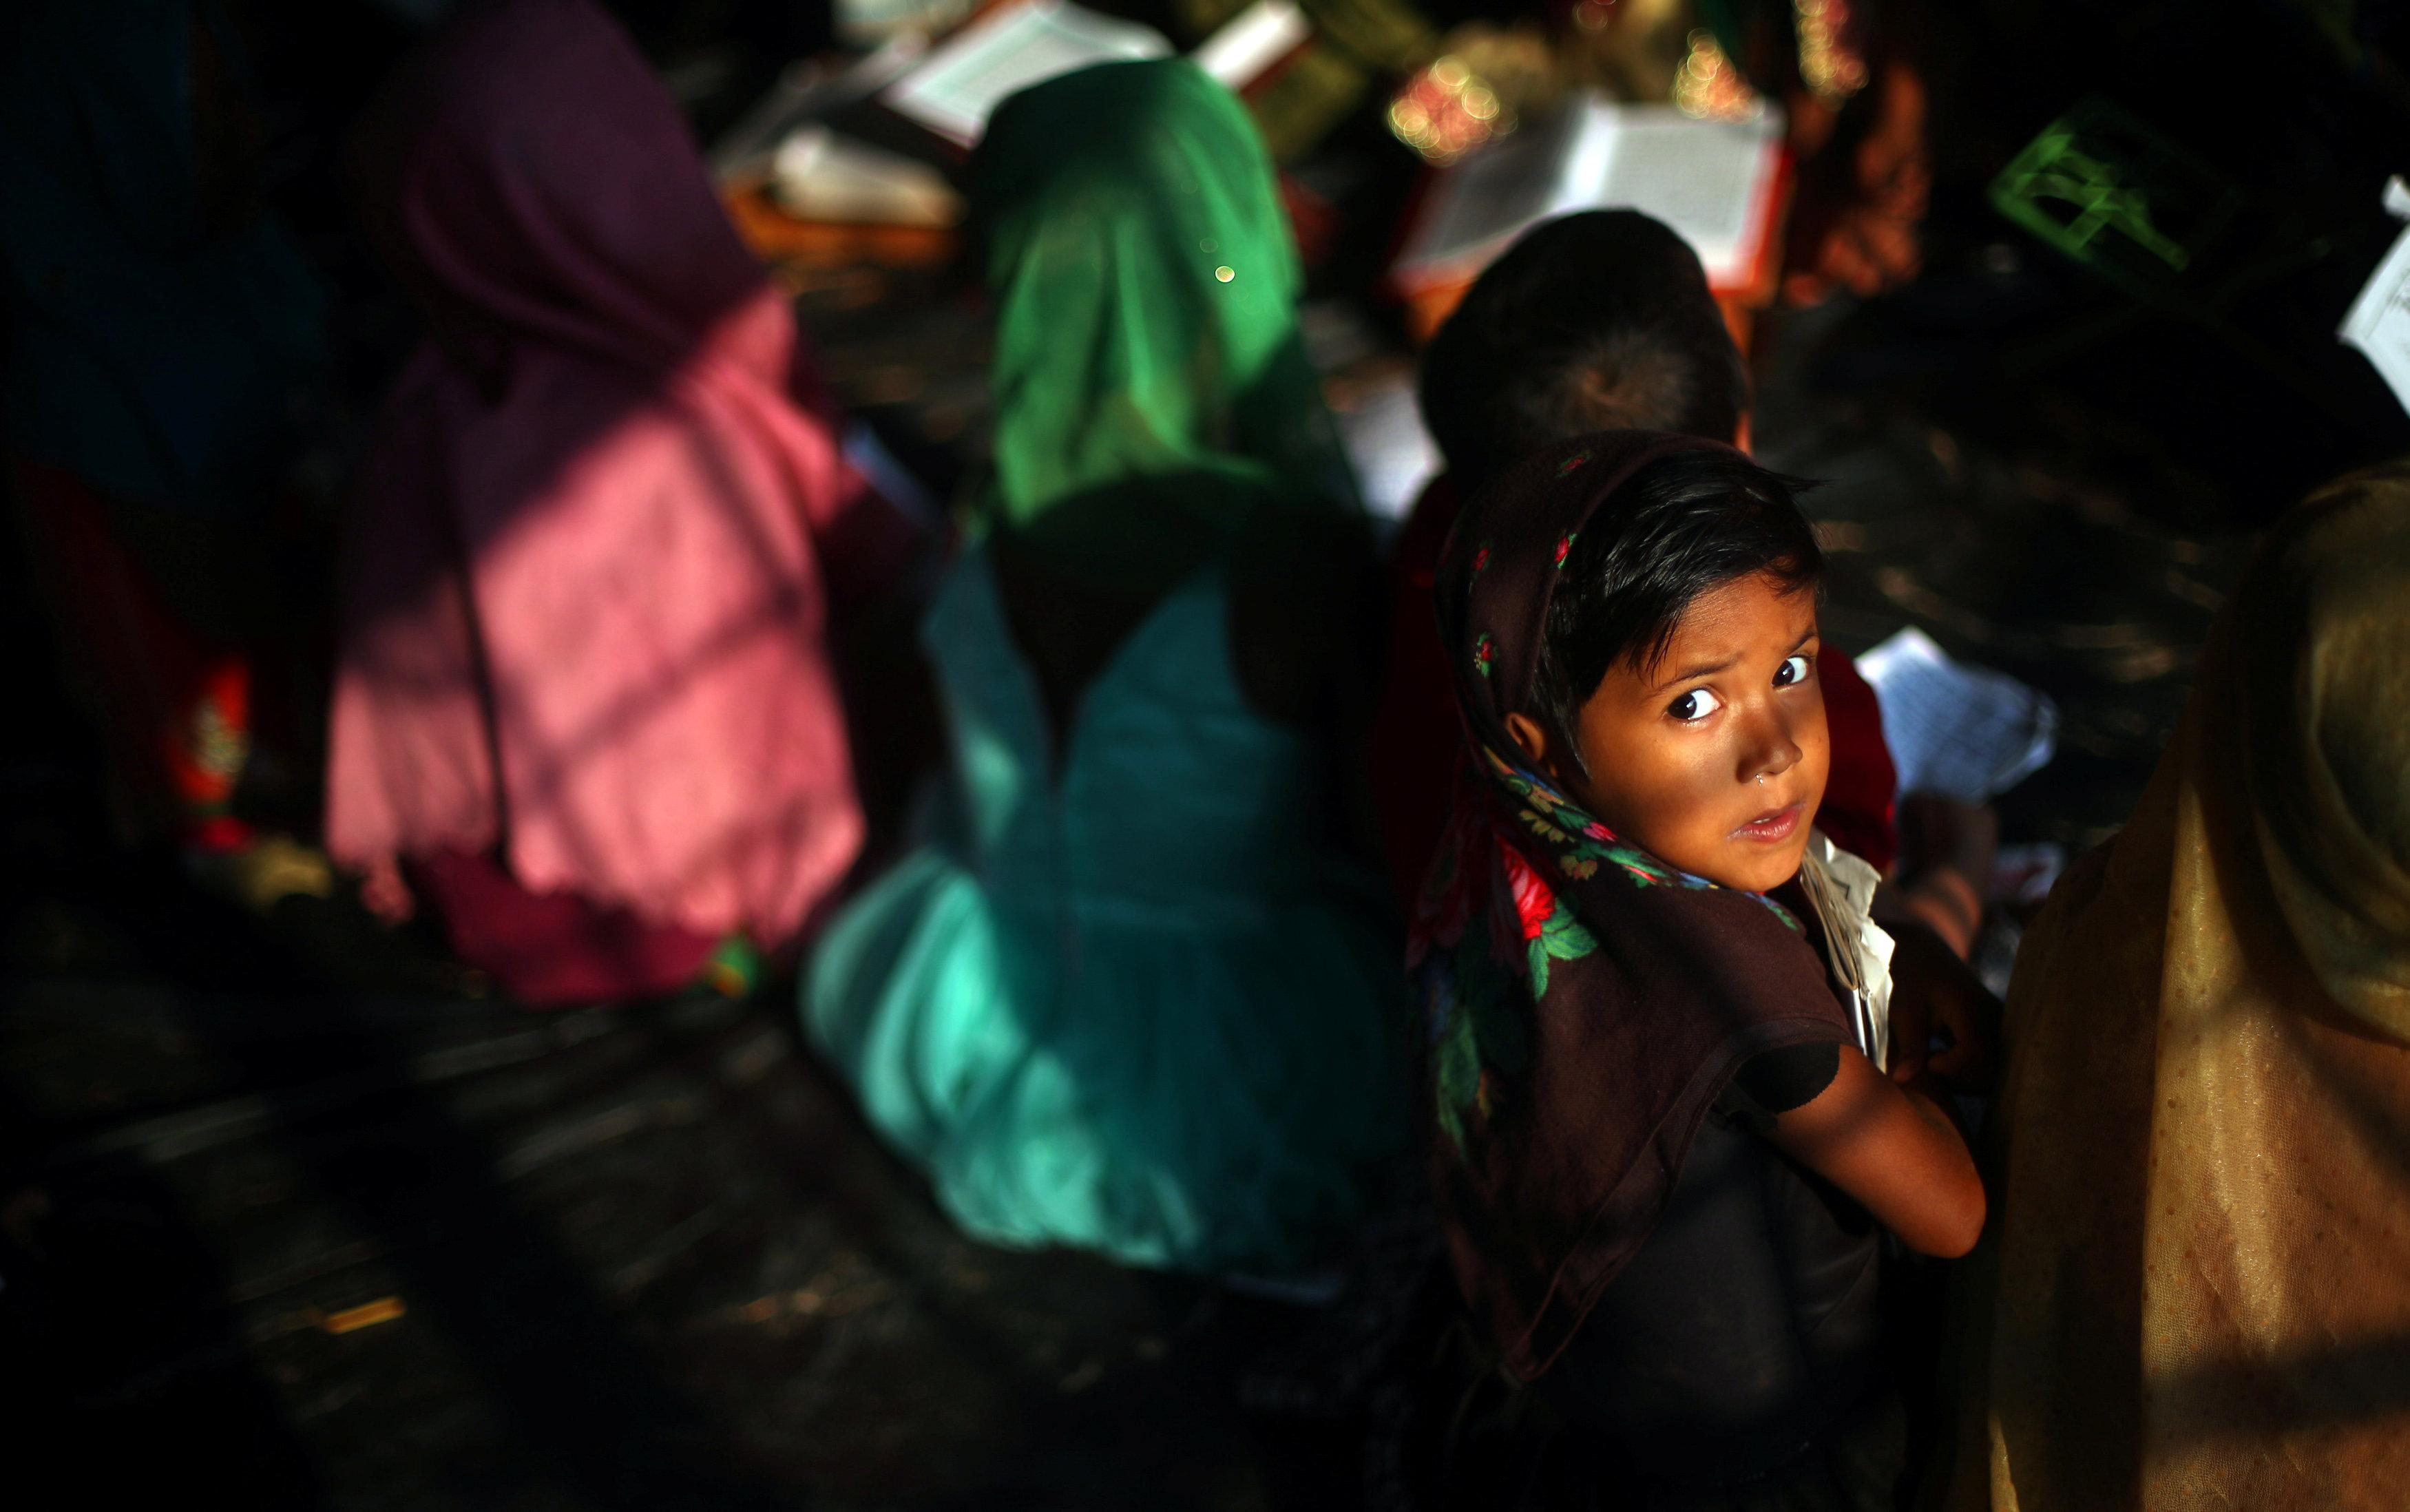 لاجئين الروهينغا